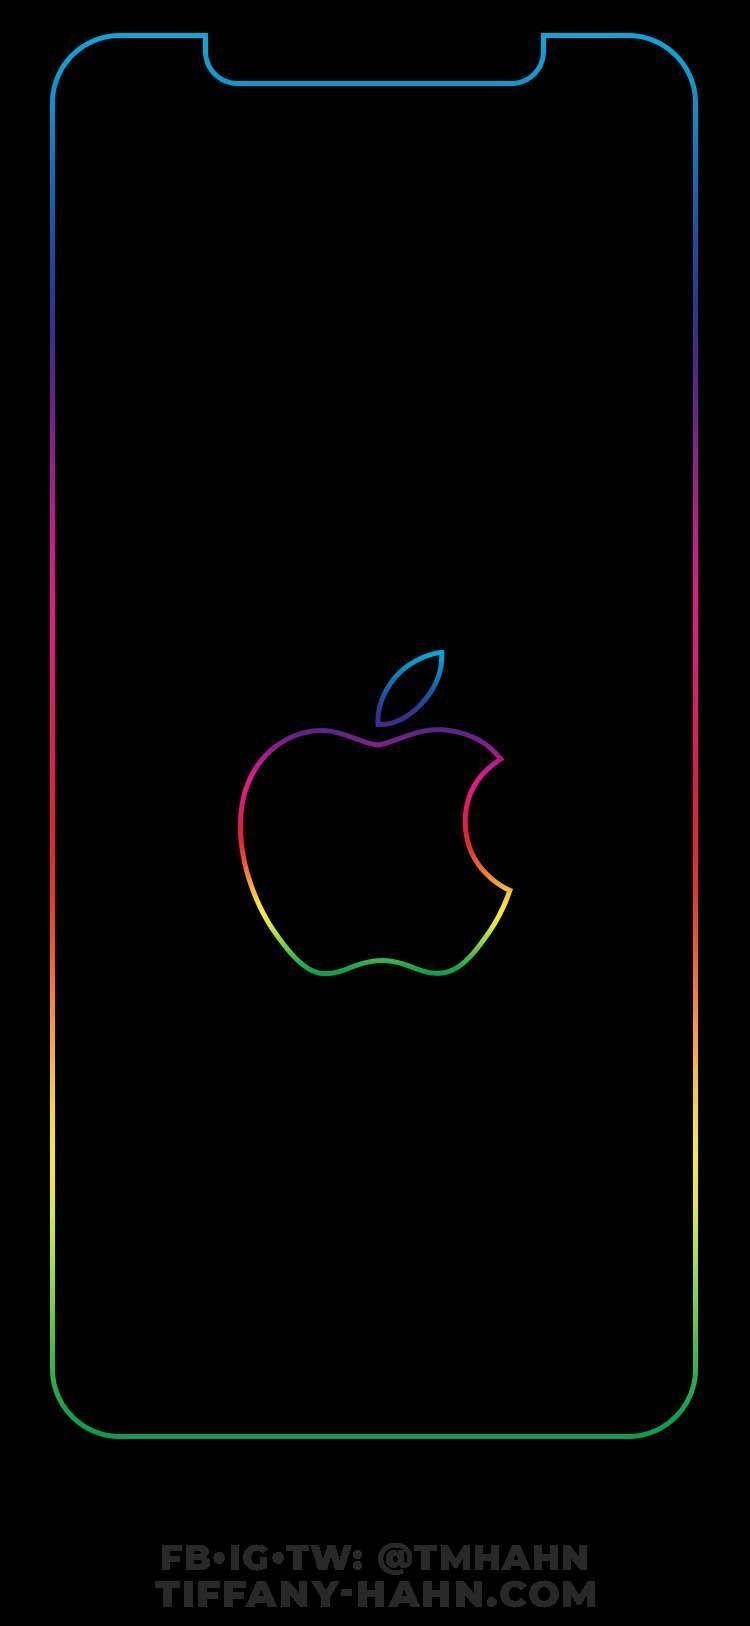 Pin On Lapices De Acuarela Rainbow Wallpaper Iphone Blue Wallpaper Iphone Apple Logo Wallpaper Iphone